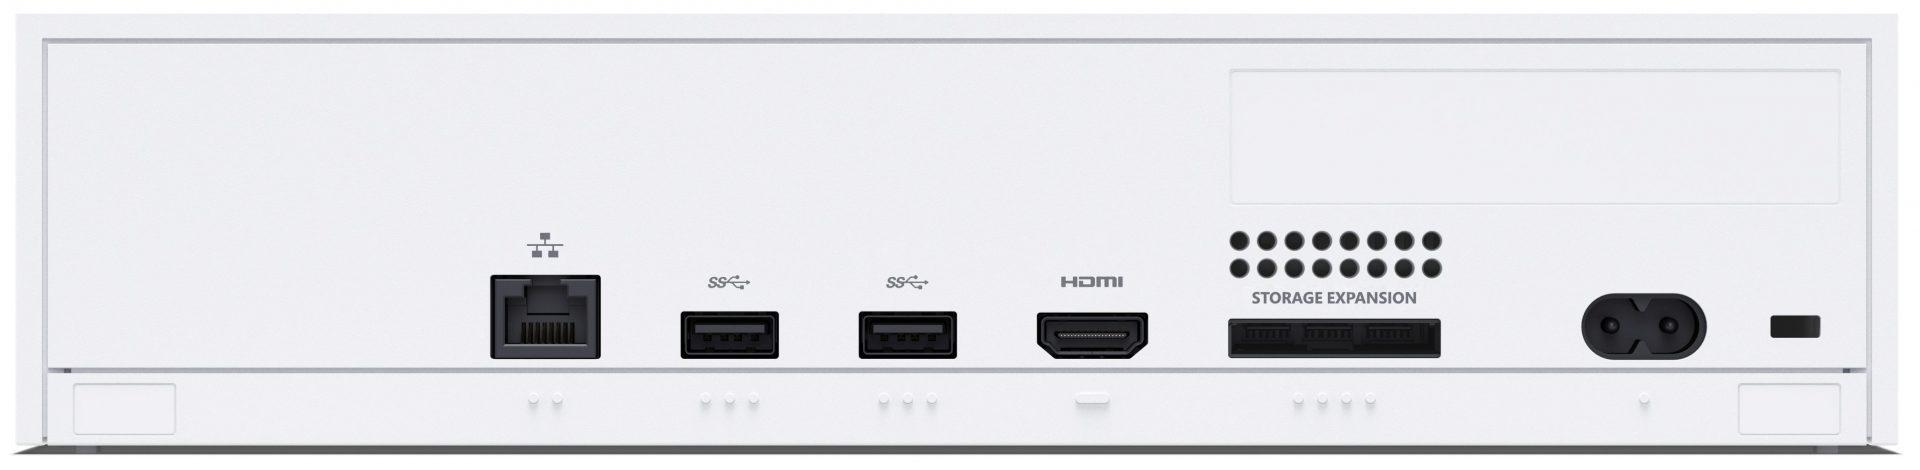 Xbox Series S - Back